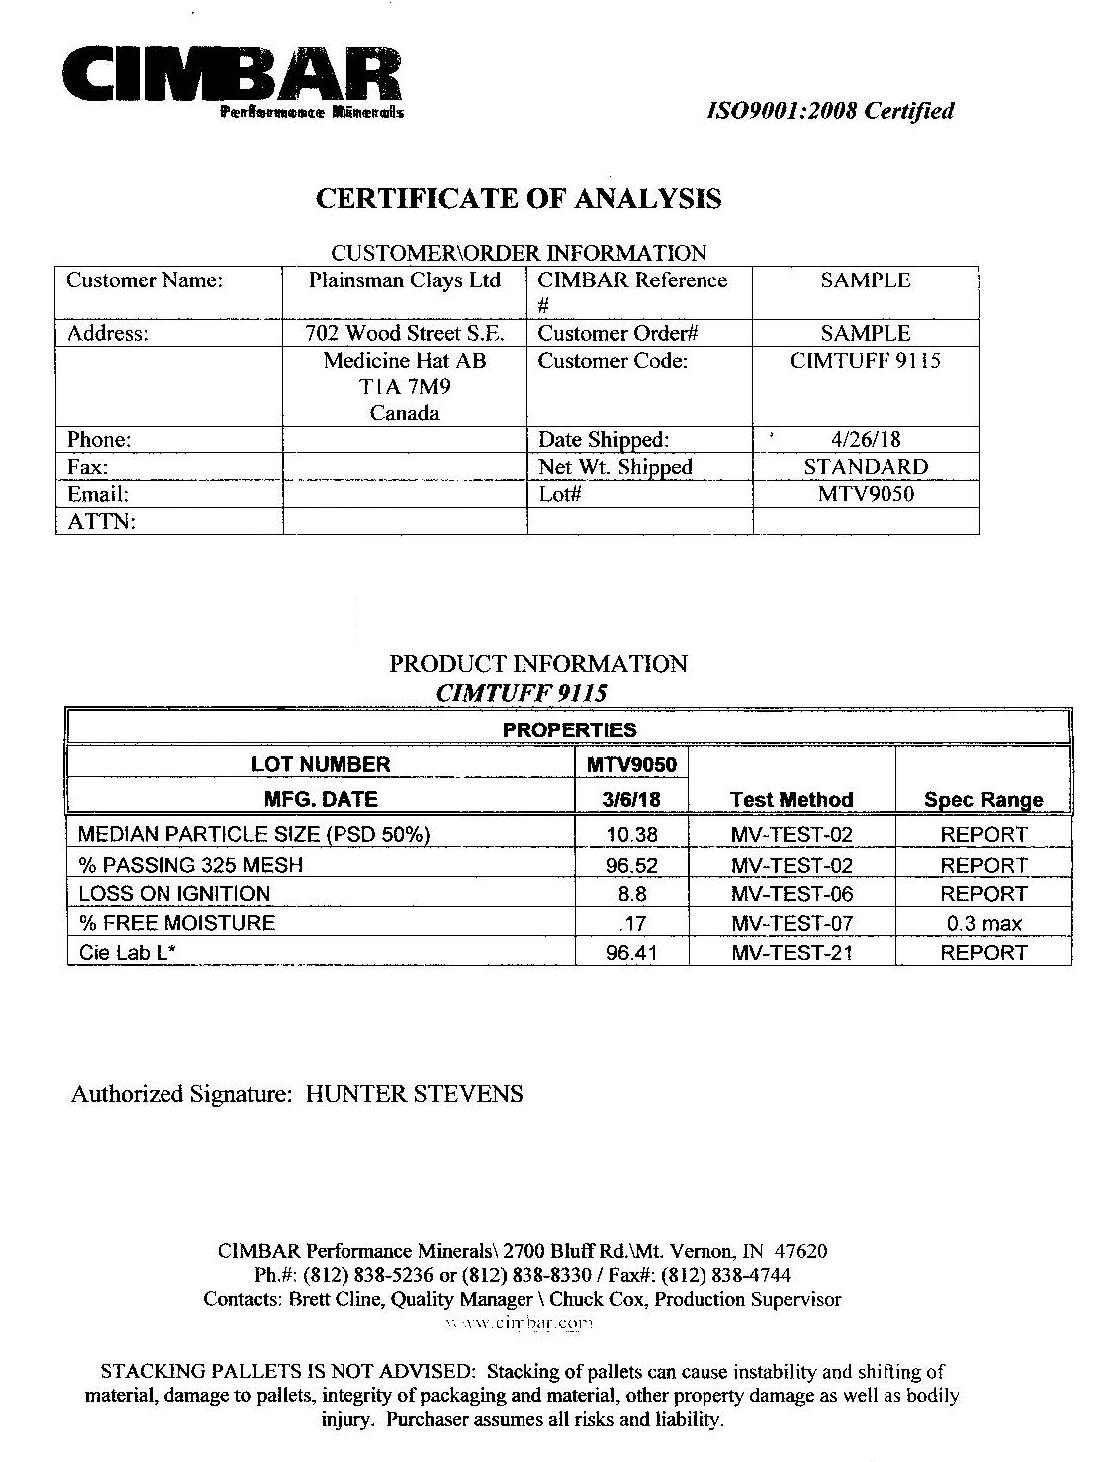 Cimbar Cimtuff 9115 Certificate of Analysis Report